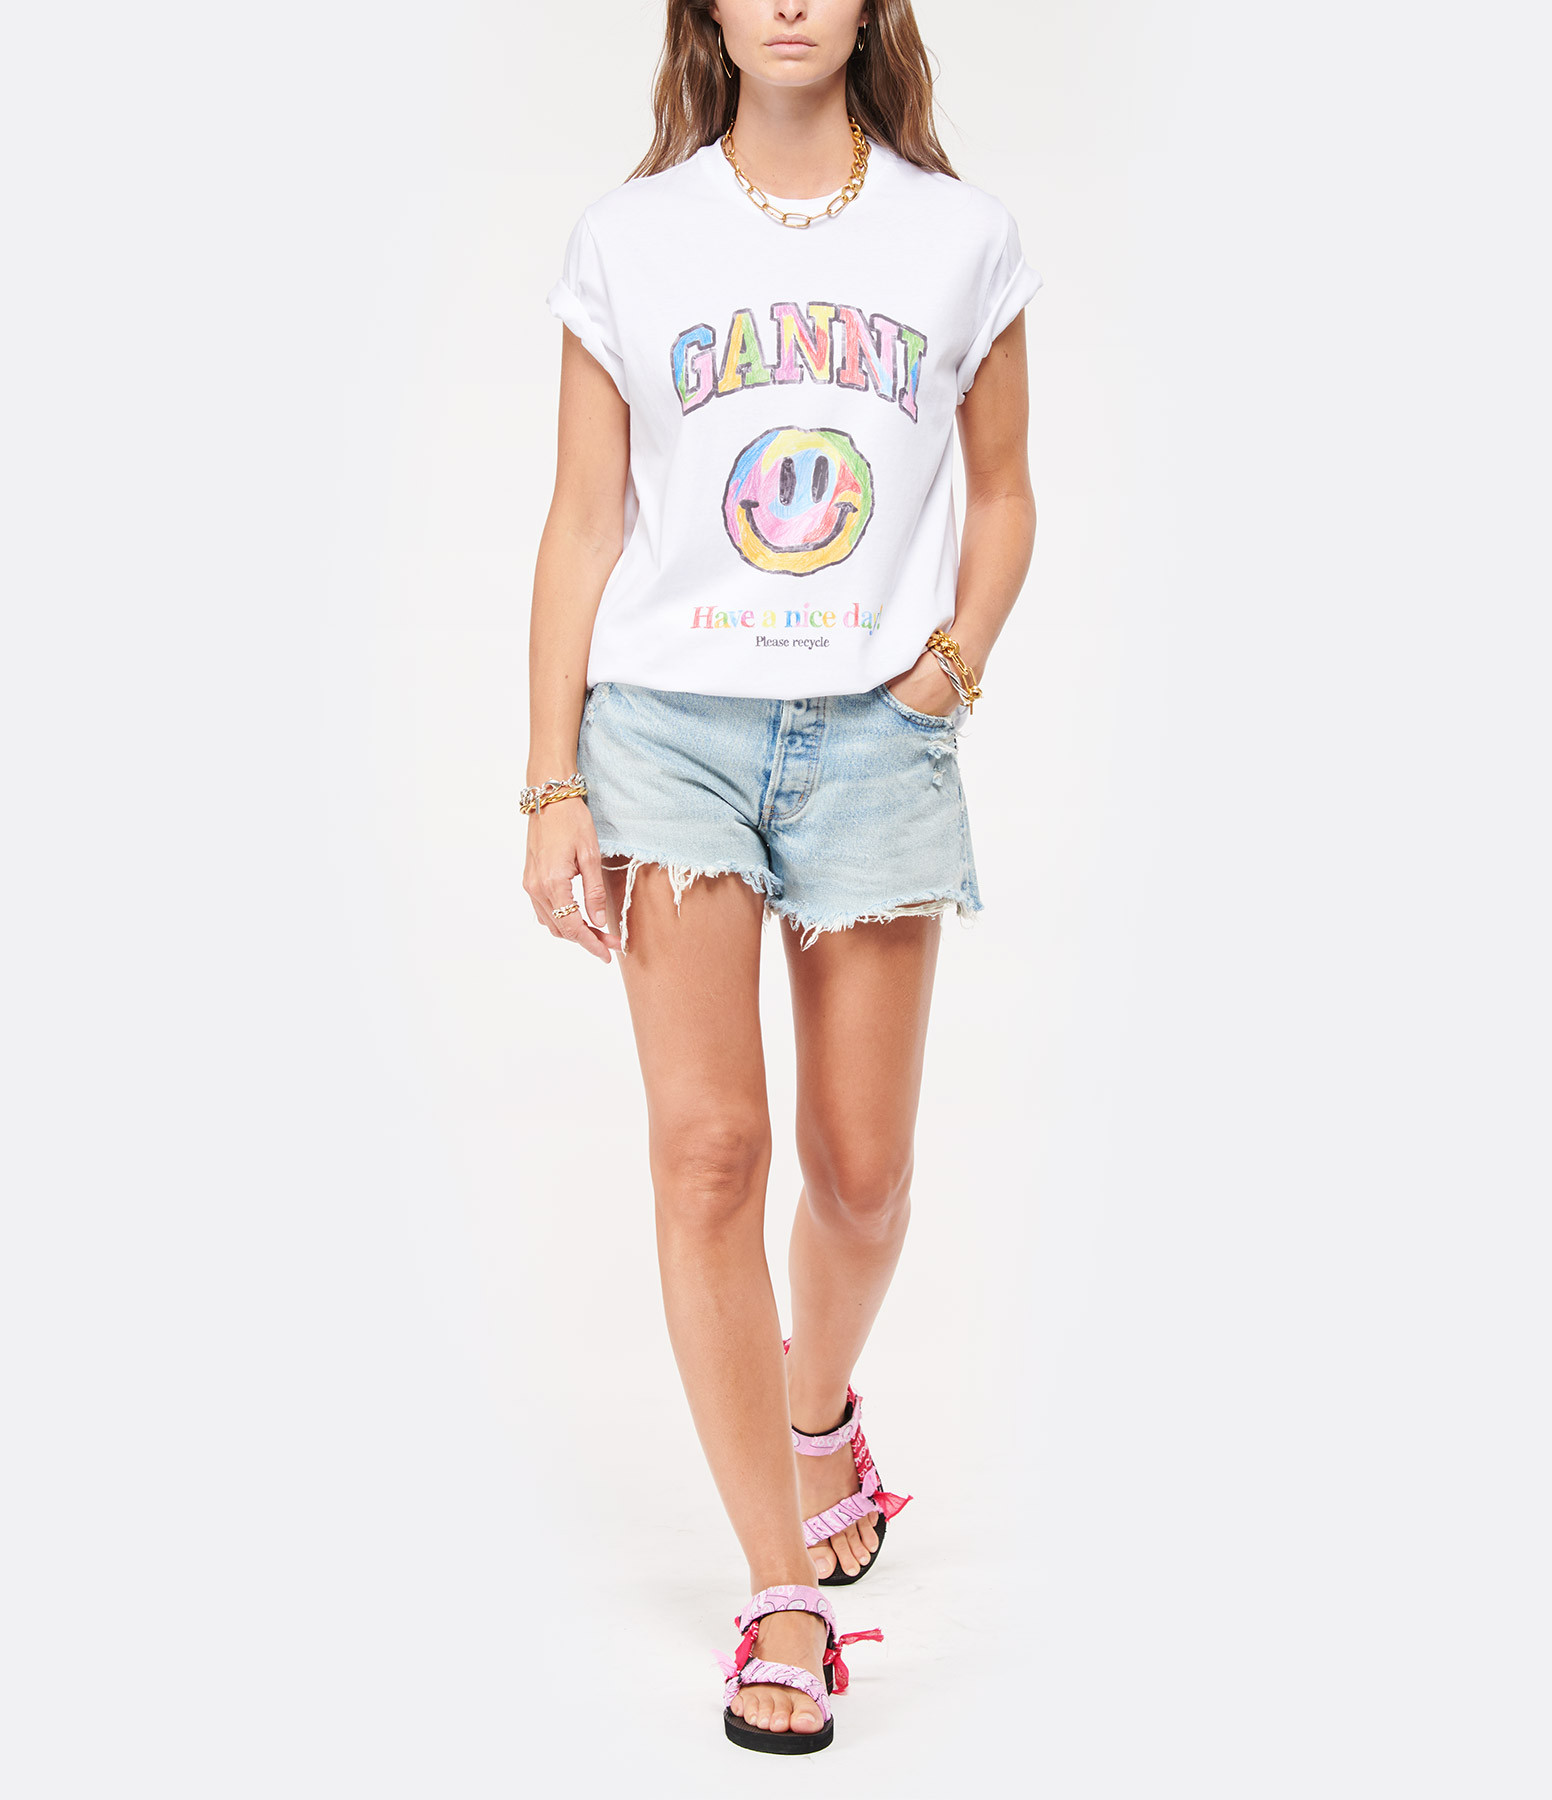 GANNI - Tee-shirt Basic Ganni Coton Blanc Multicolore